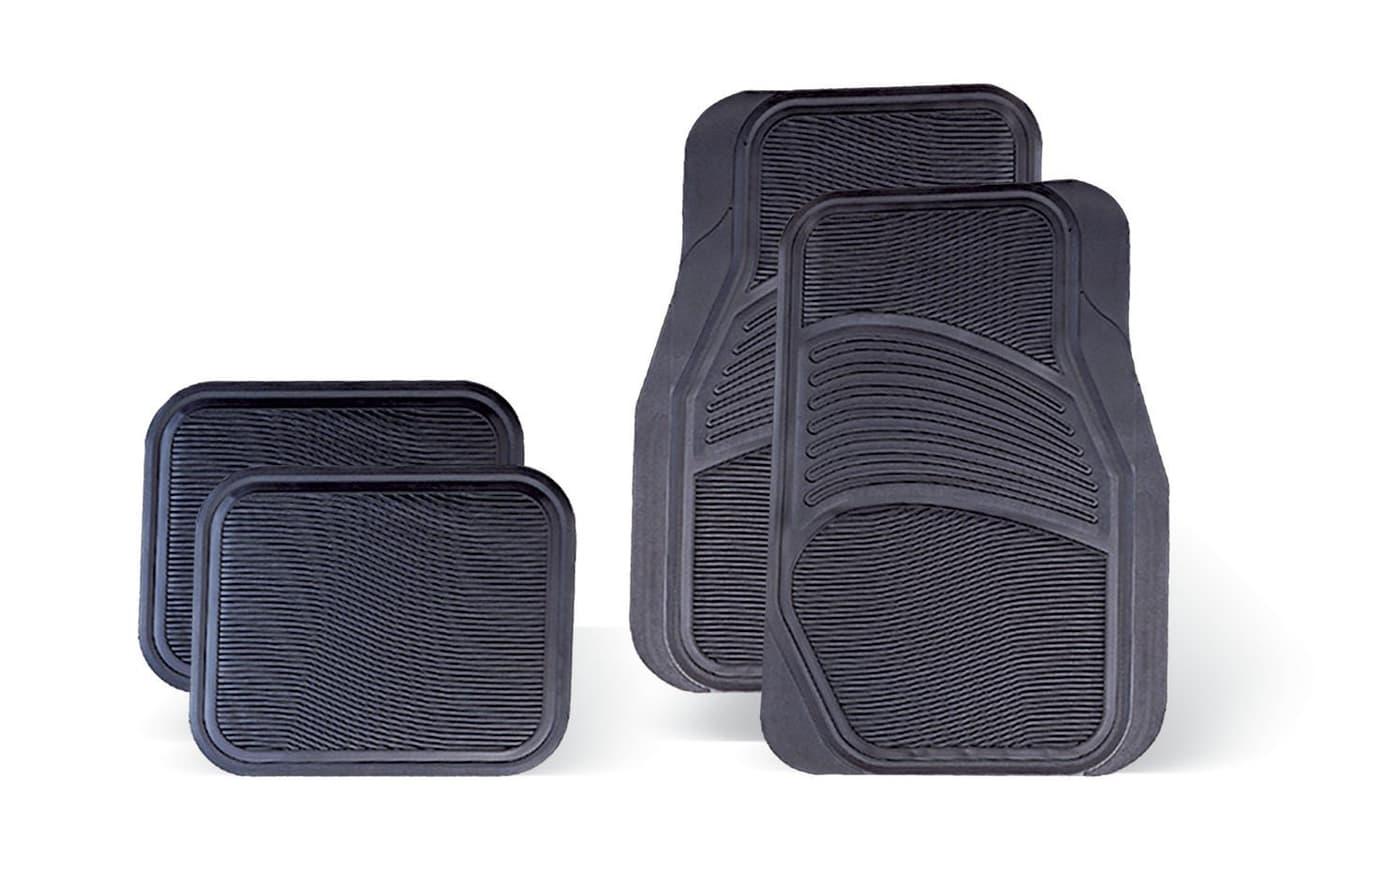 miocar auto gummimatten set migros. Black Bedroom Furniture Sets. Home Design Ideas